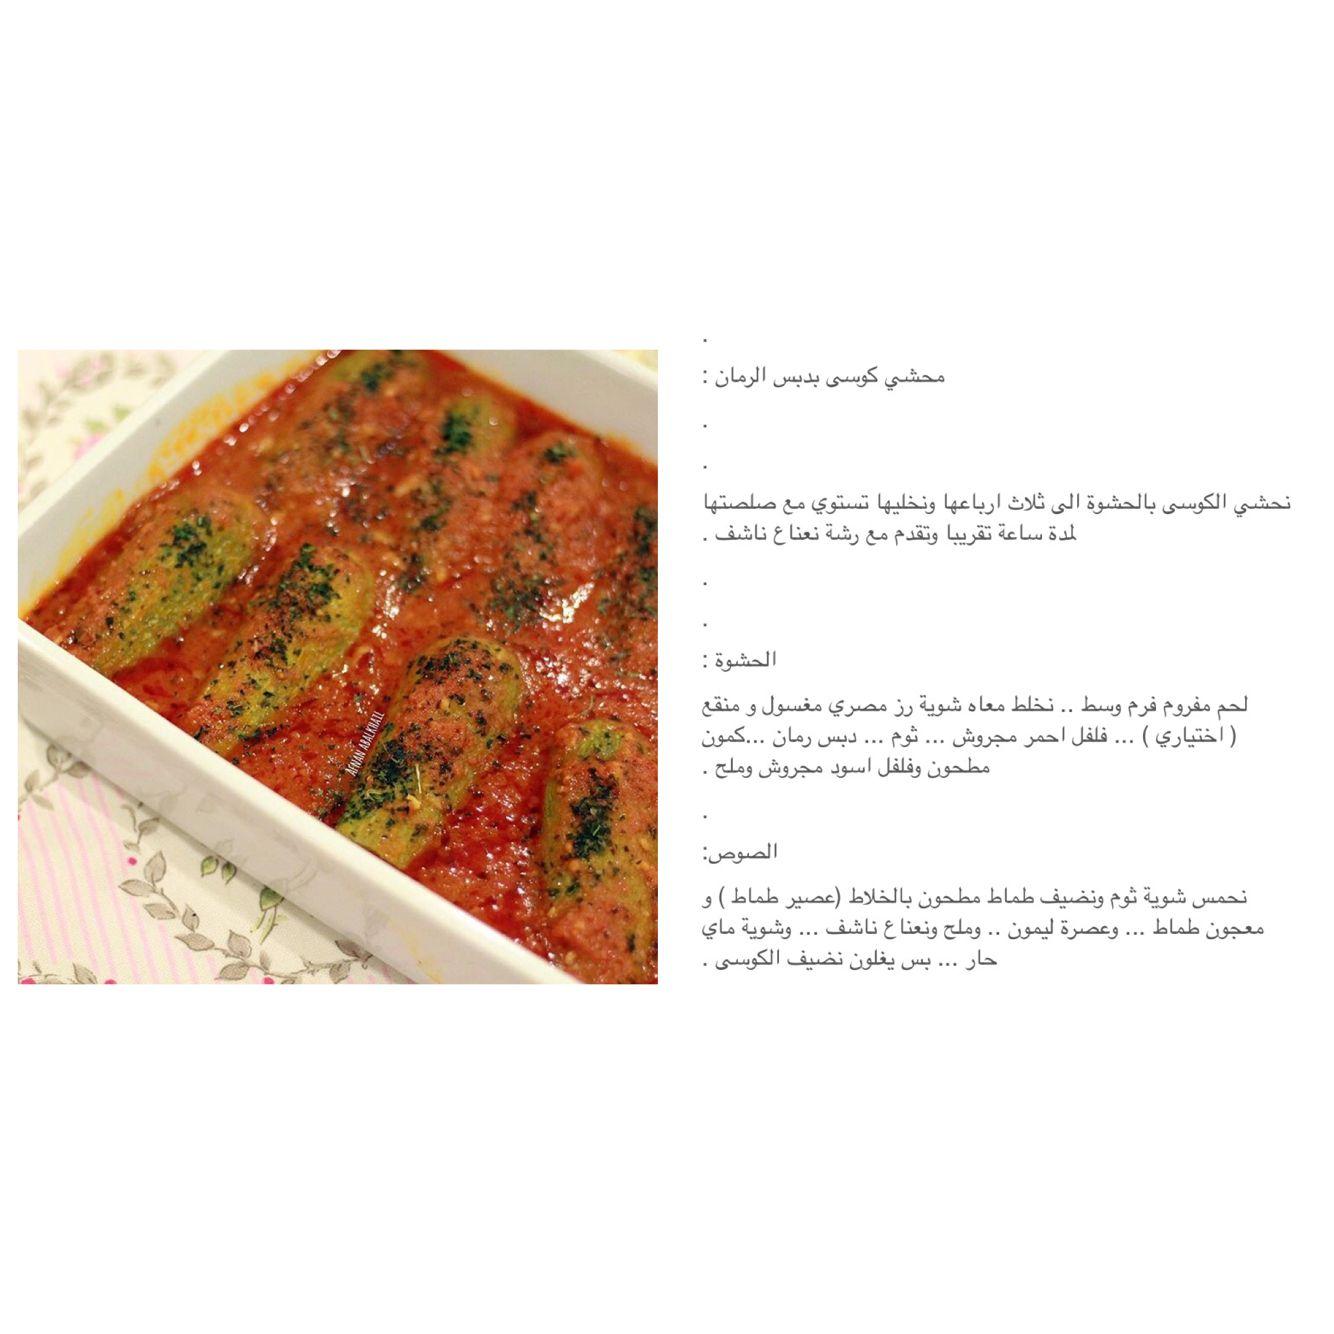 محشي كوسا بدبس الرمان Cooking Recipes Recipes Arabic Food